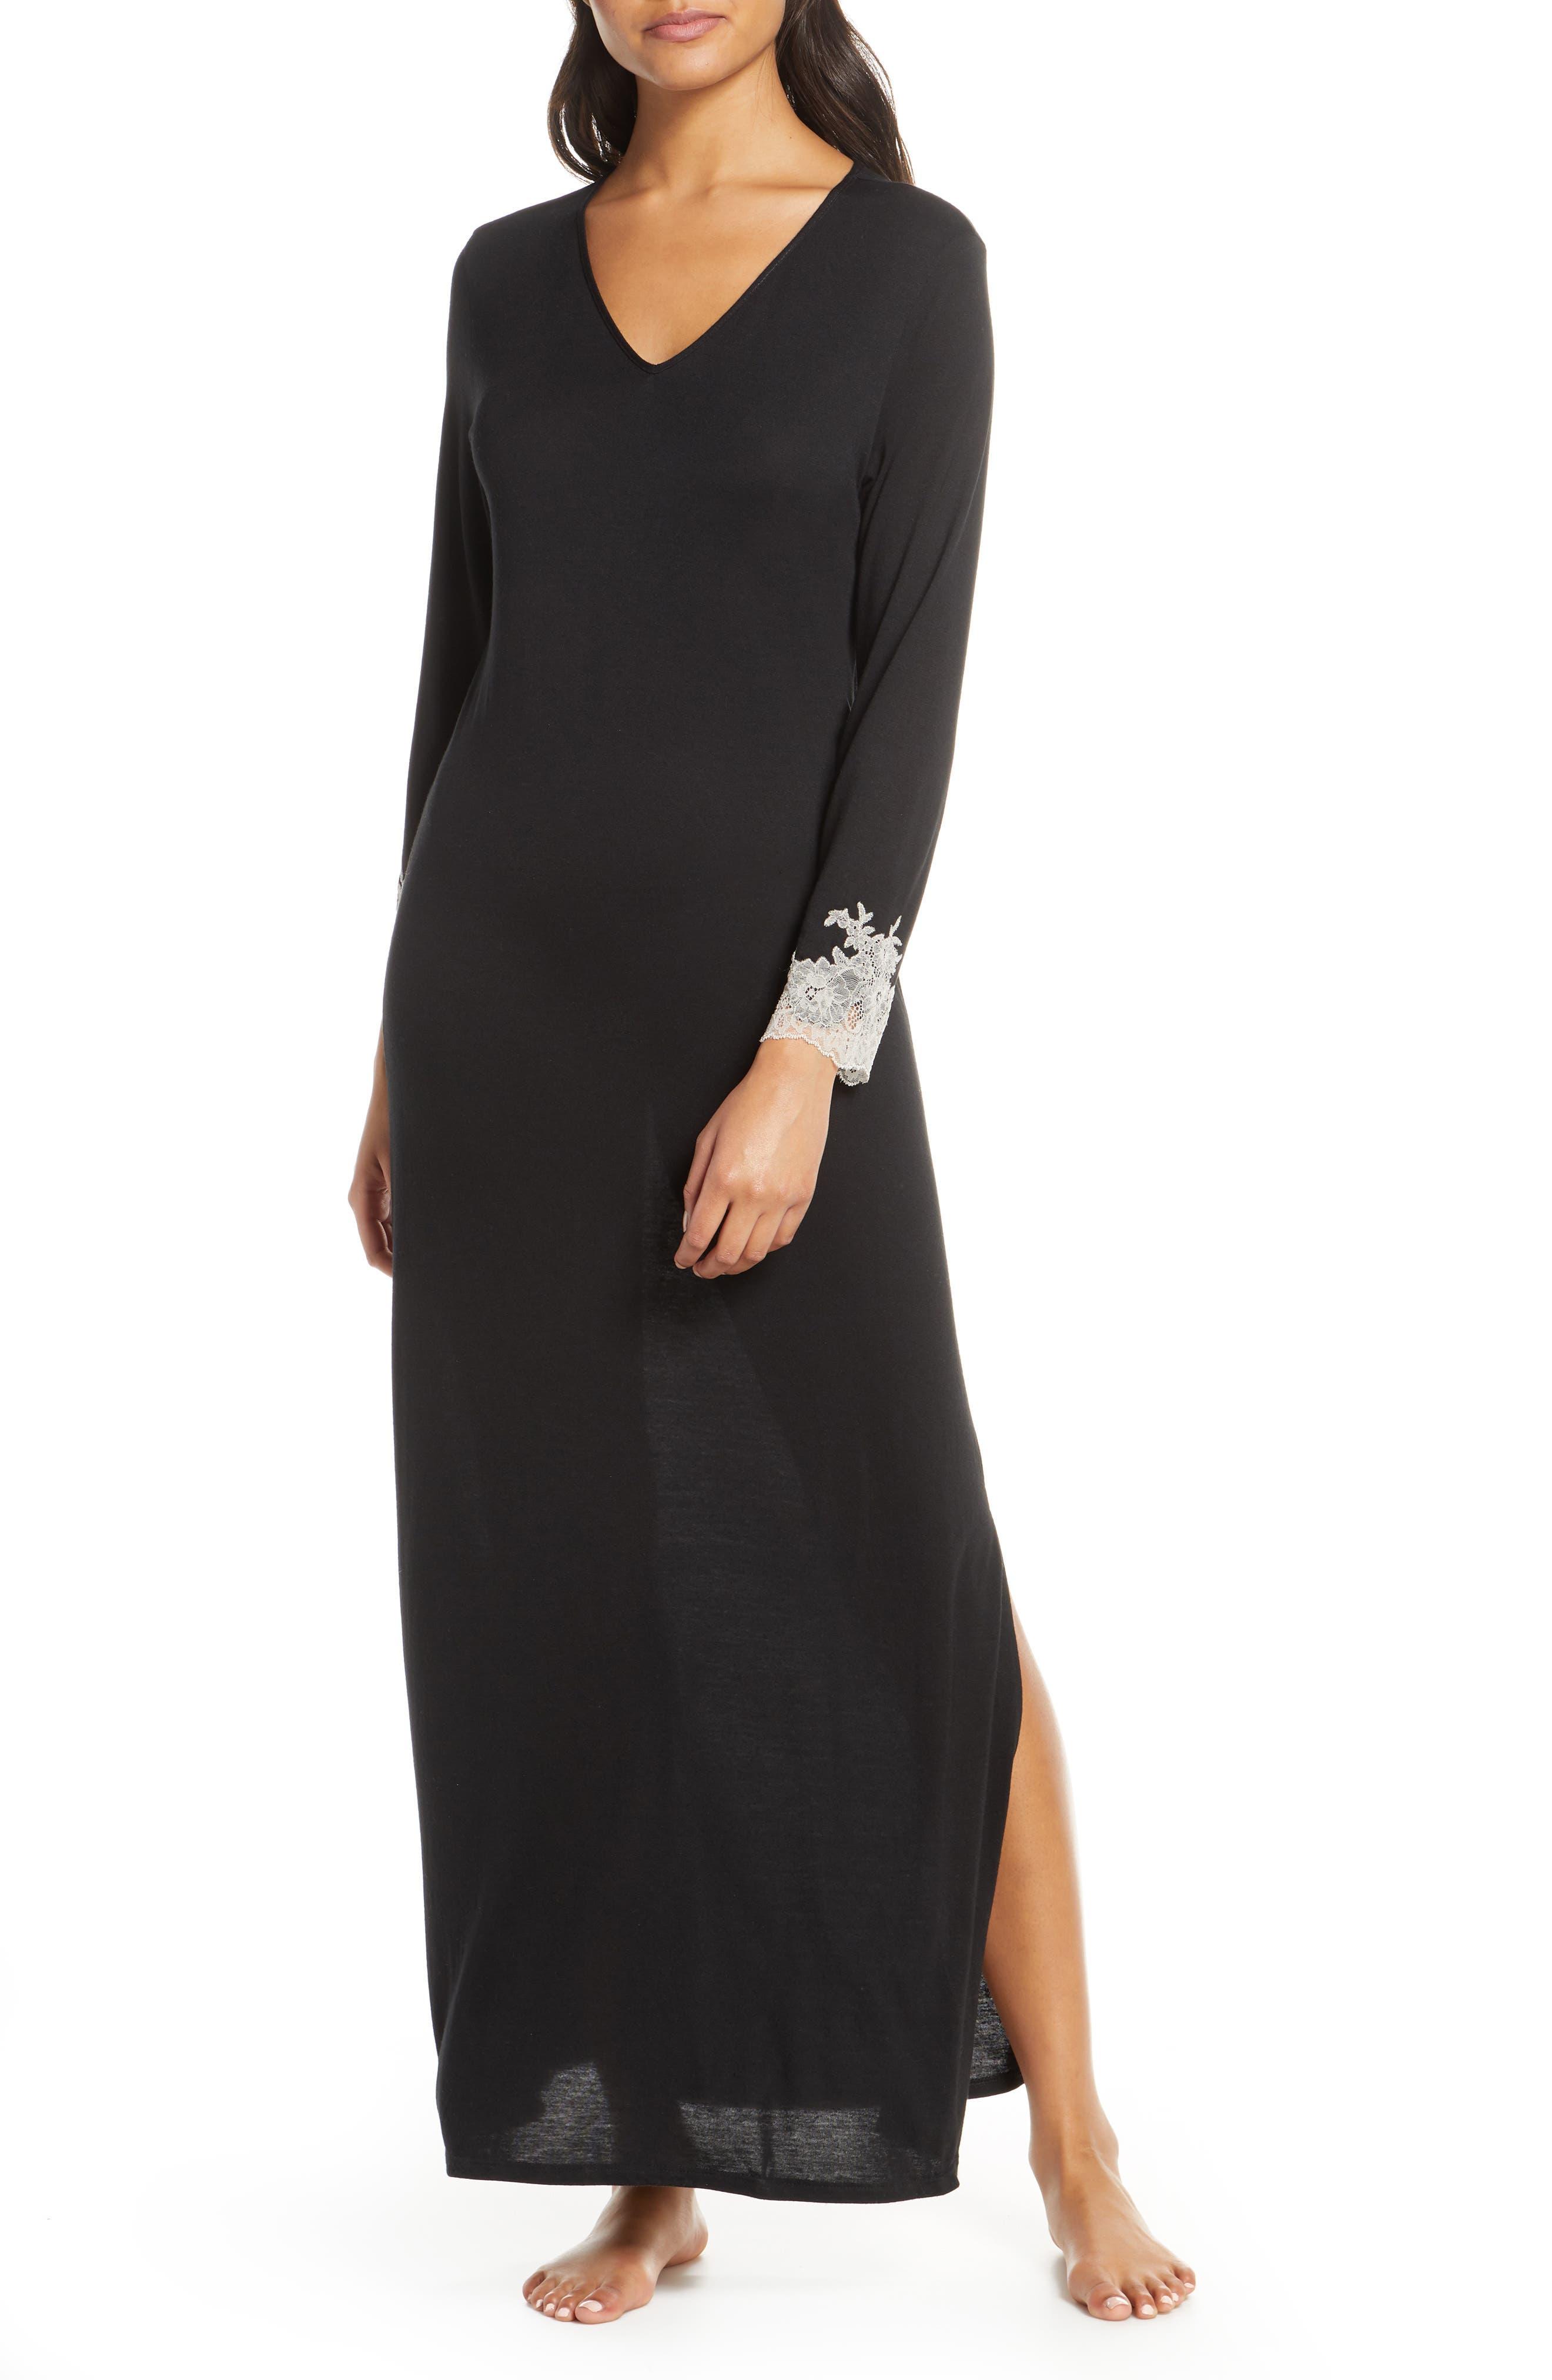 Natori Lounger Luxe Shangri La Nightgown, Black